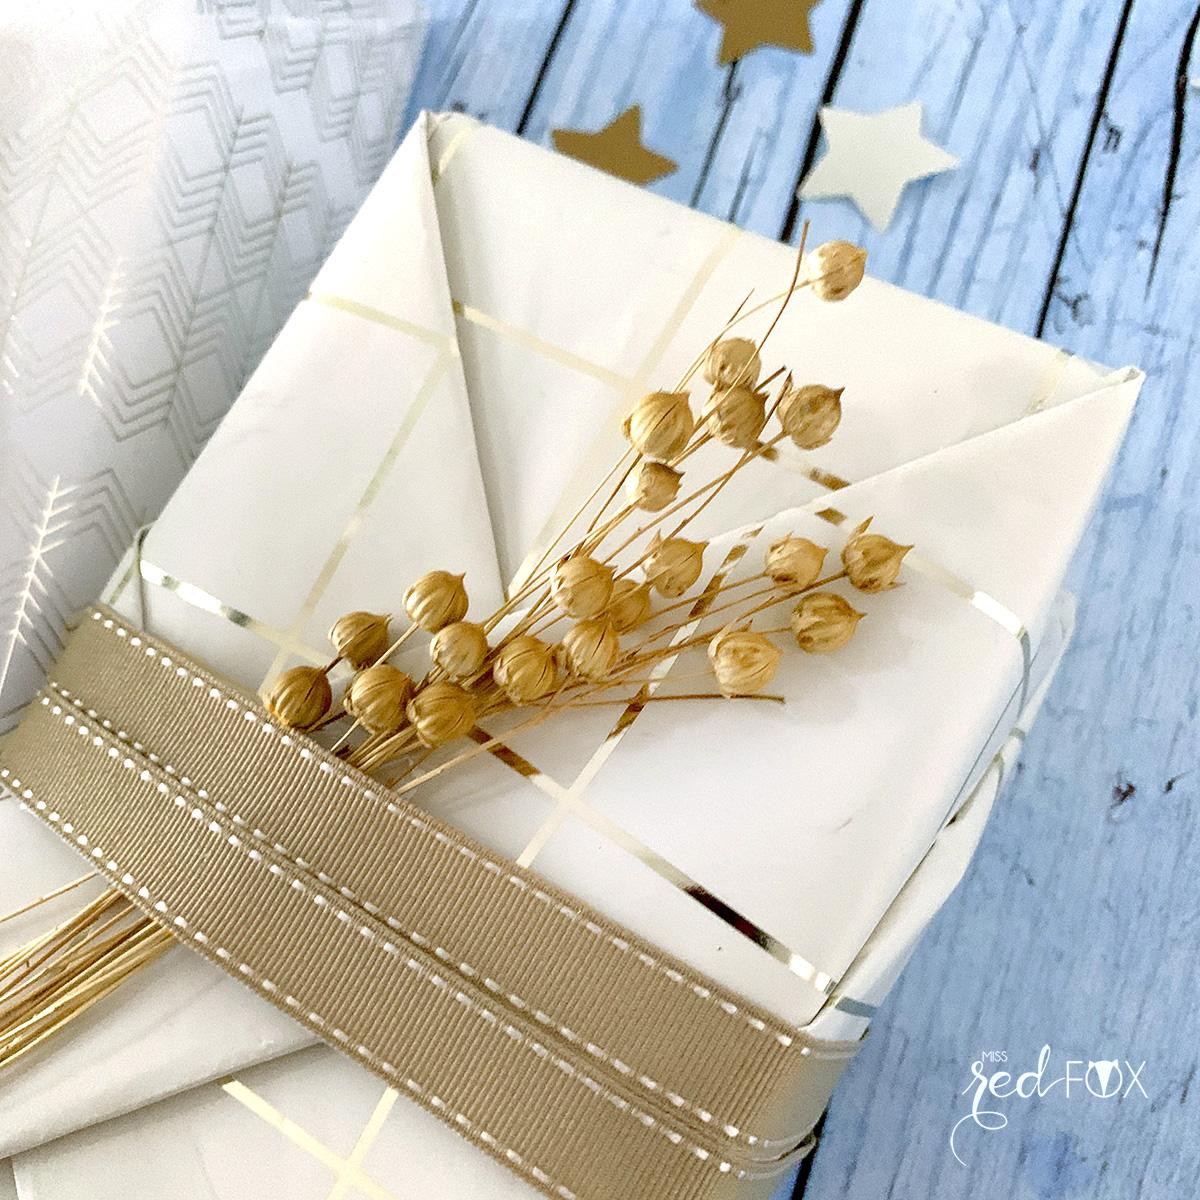 missredfox - 12giftswithlovegoesxmas - 24 - Japanisch inspirierte Geschenkverpackung 4